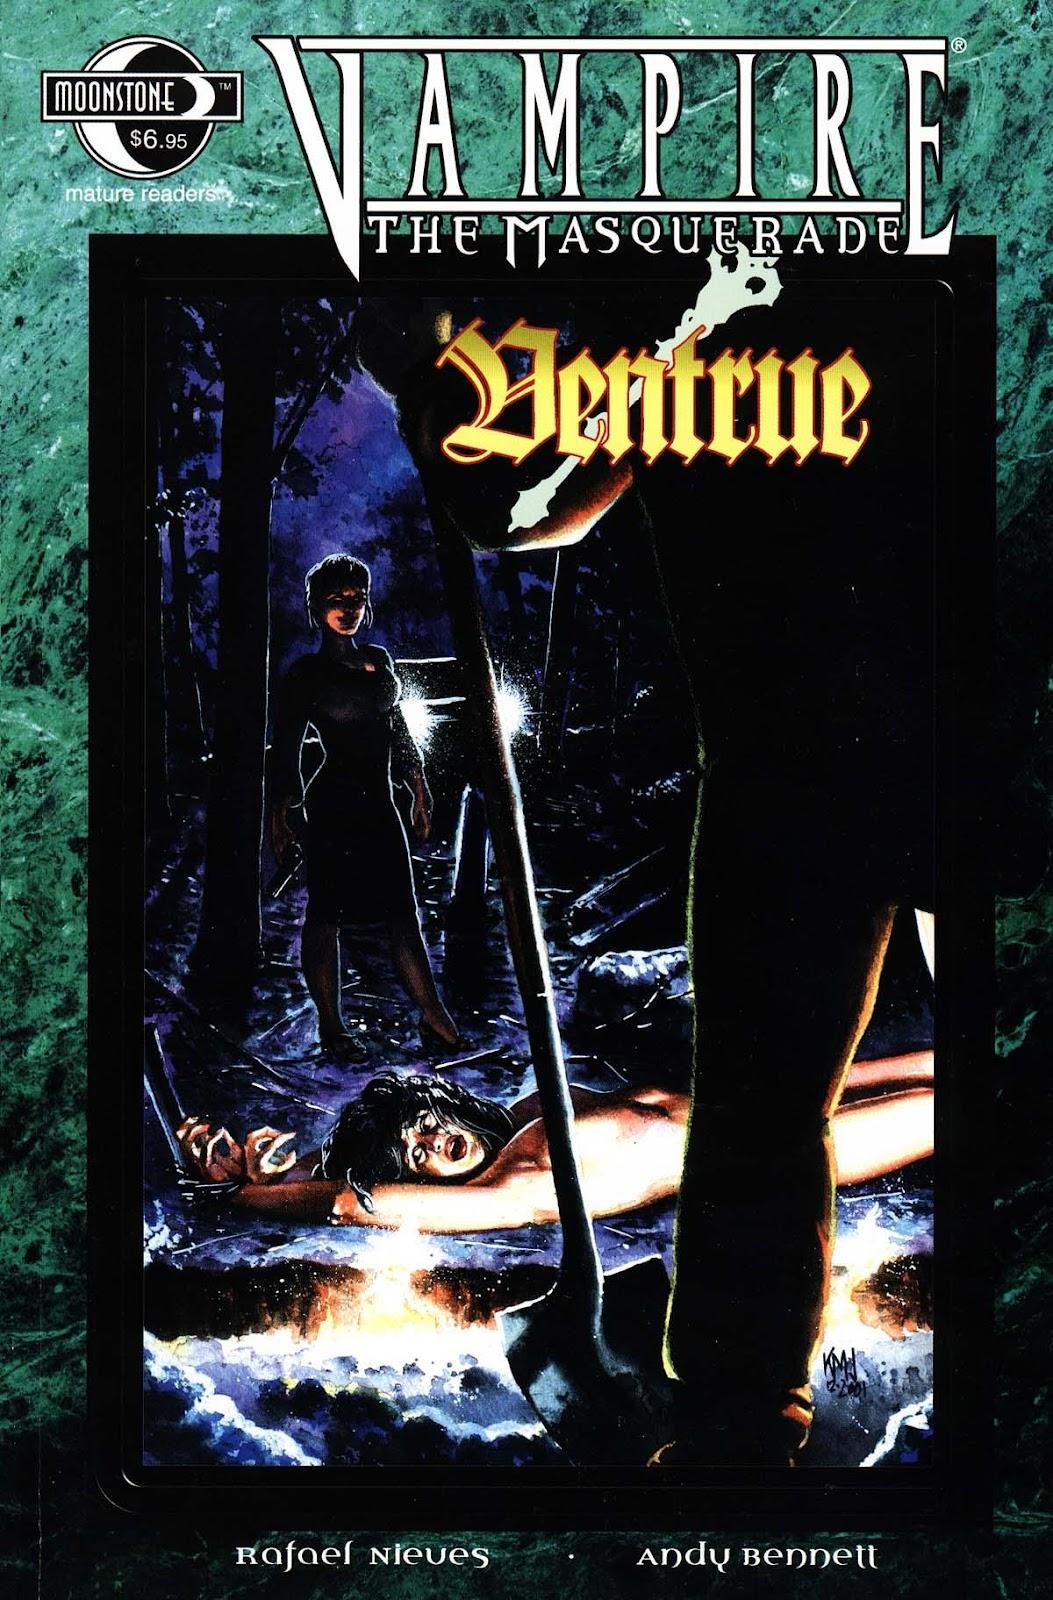 Read online Vampire the Masquerade comic -  Issue # Ventrue - 1